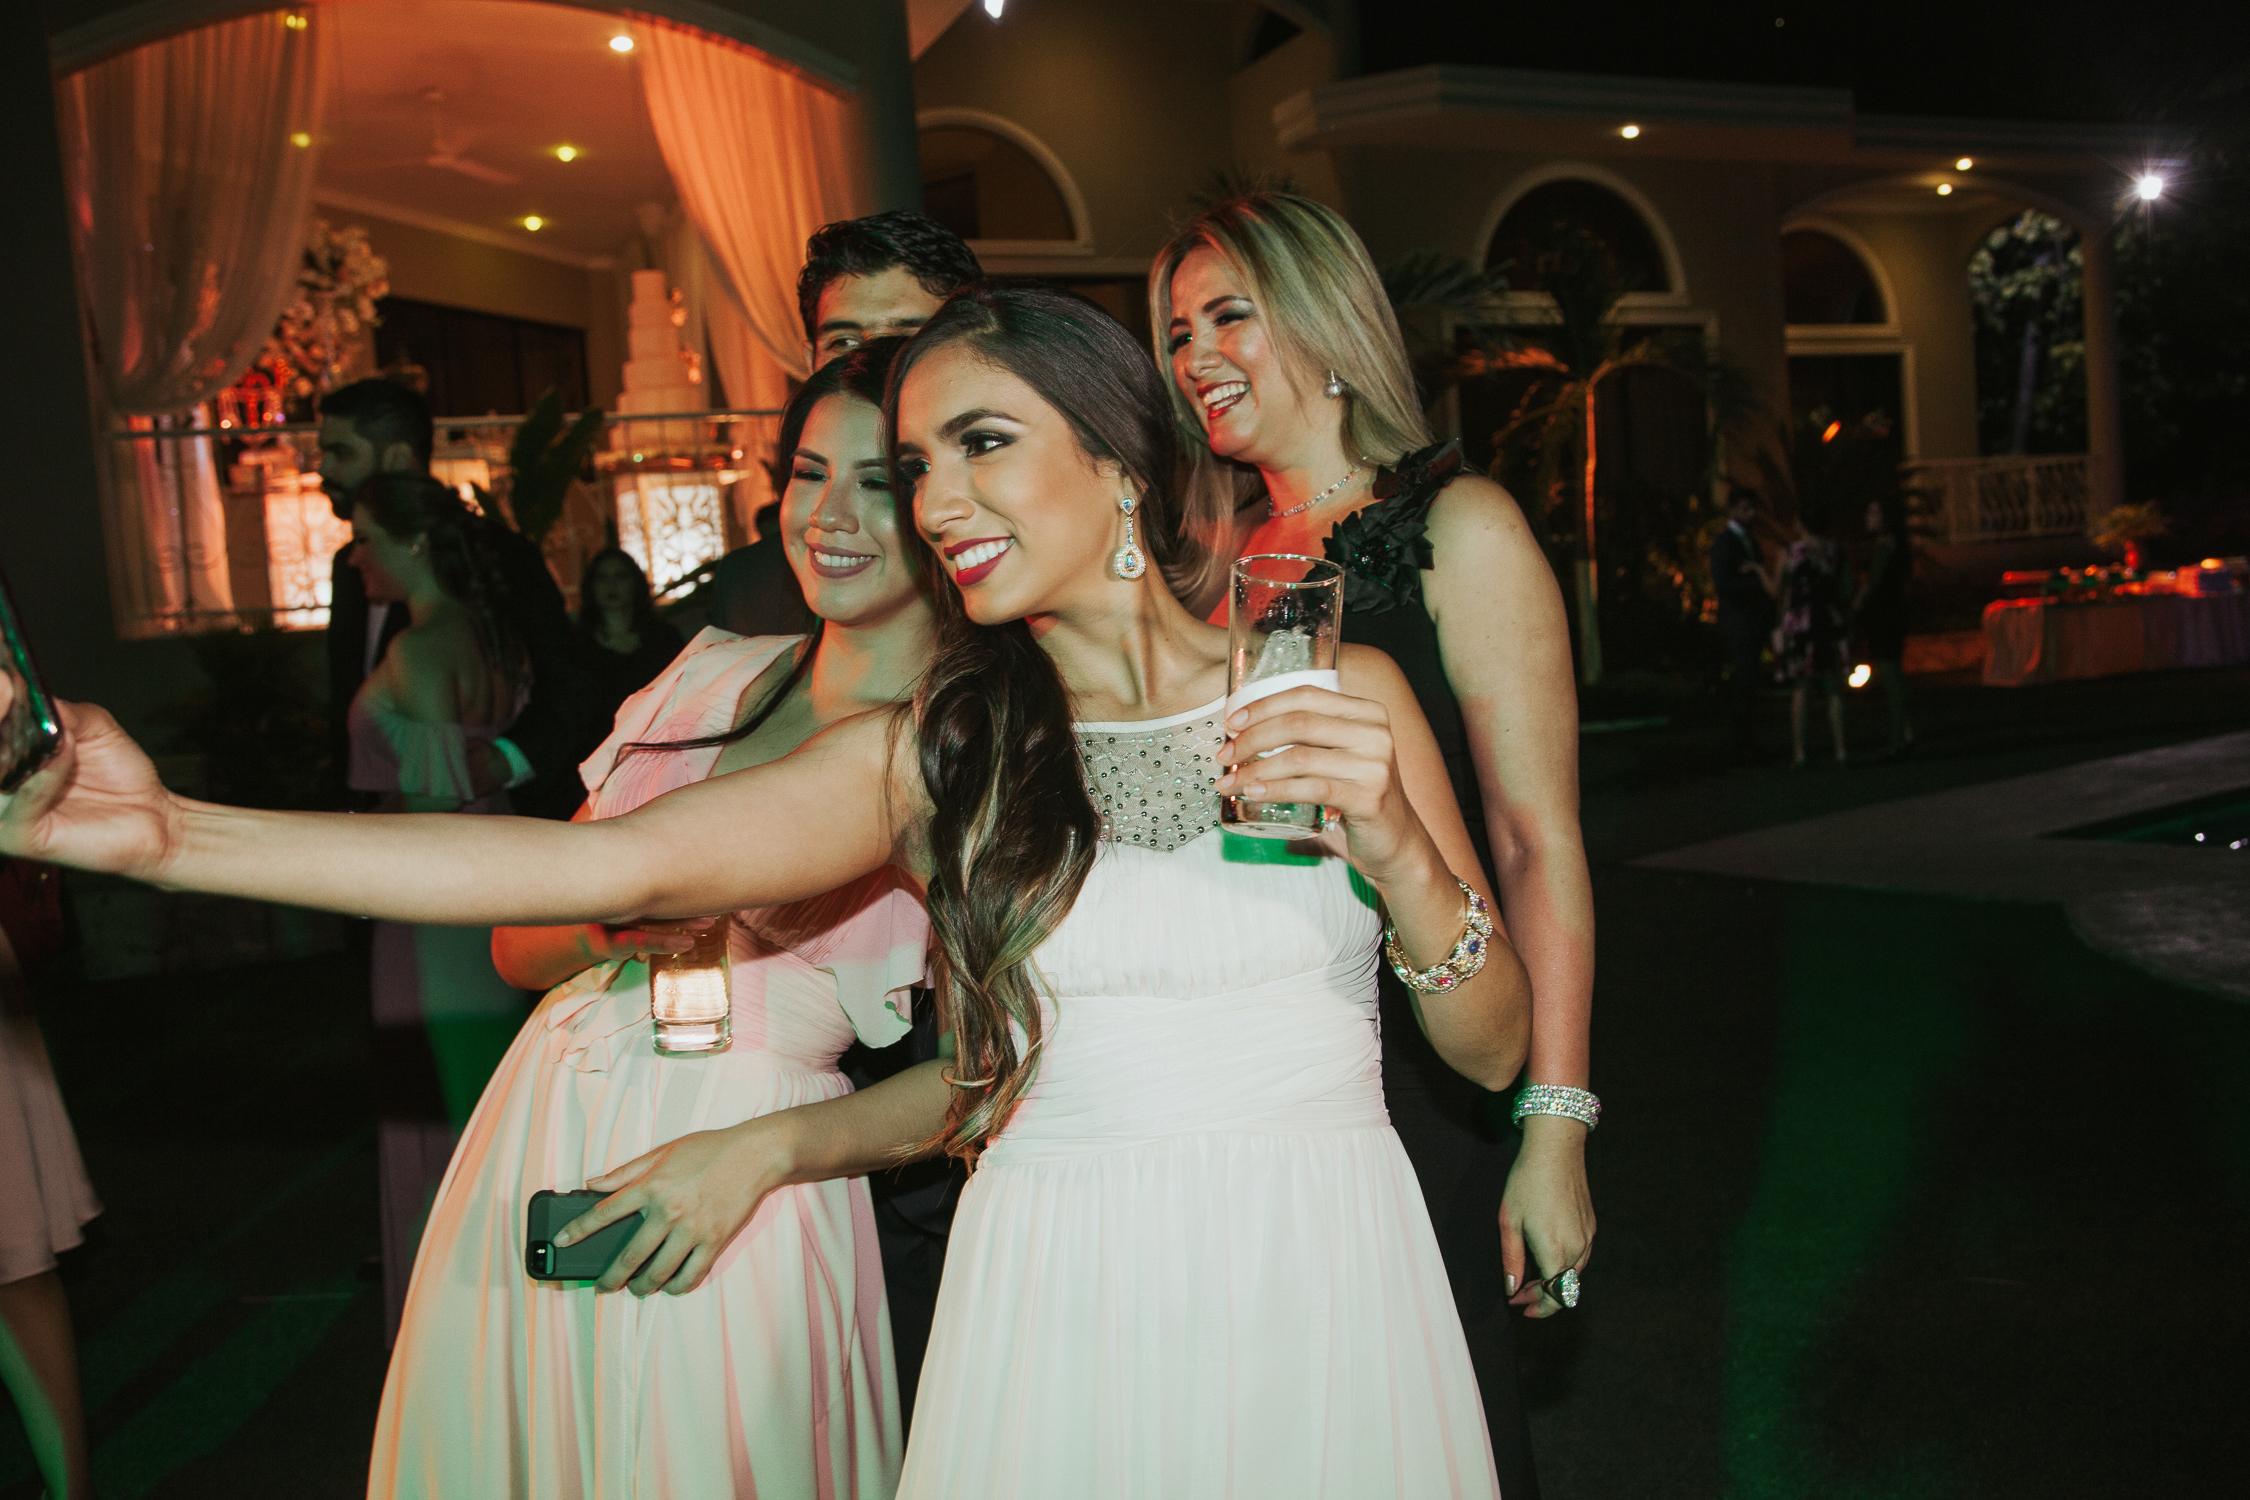 Michelle-Agurto-Fotografia-Bodas-Ecuador-Destination-Wedding-Photographer-Pauli-Edwin-37.JPG